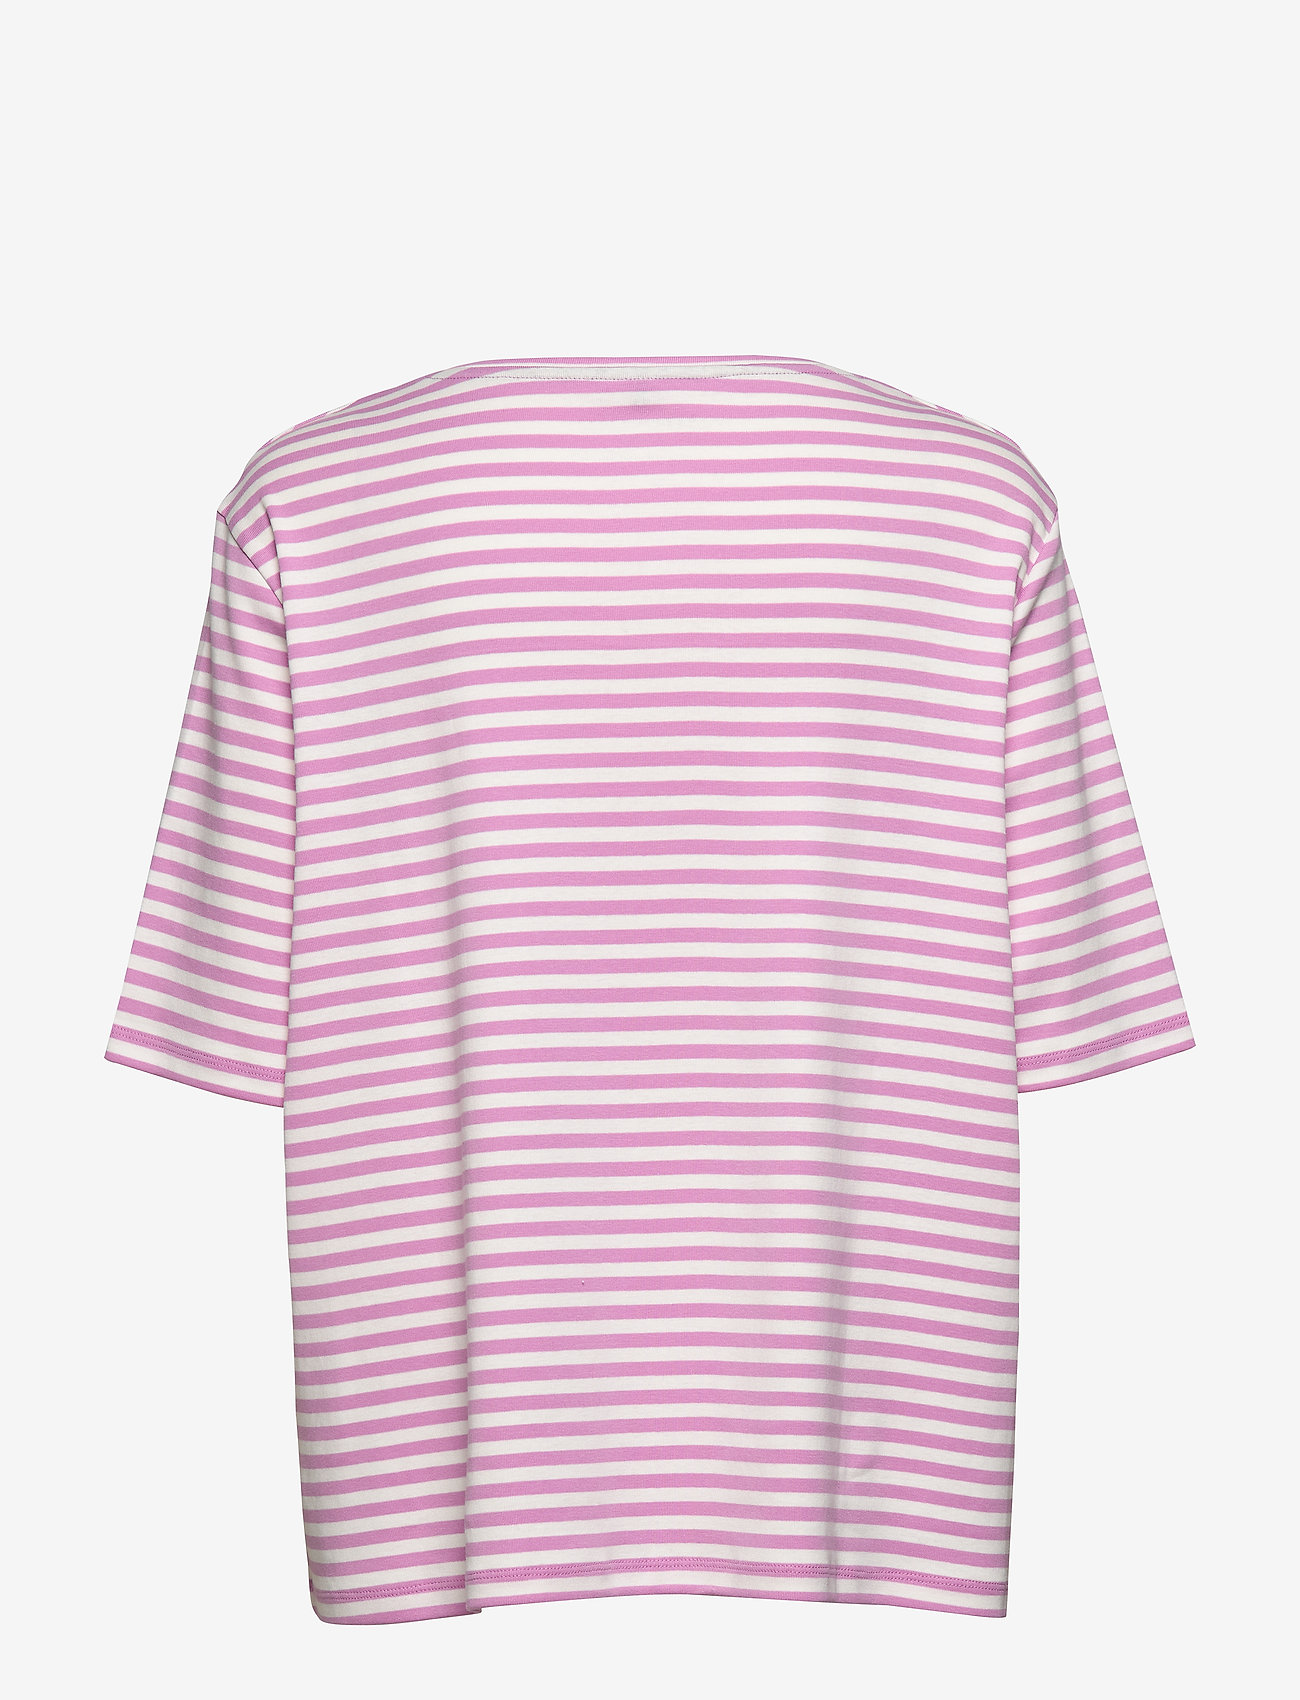 Gerry Weber Edition T-SHIRT SHORT-SLEEVE - T-shirty i zopy LILAC/PINK/ECRU/WHITE HOOPS - Kobiety Odzież.